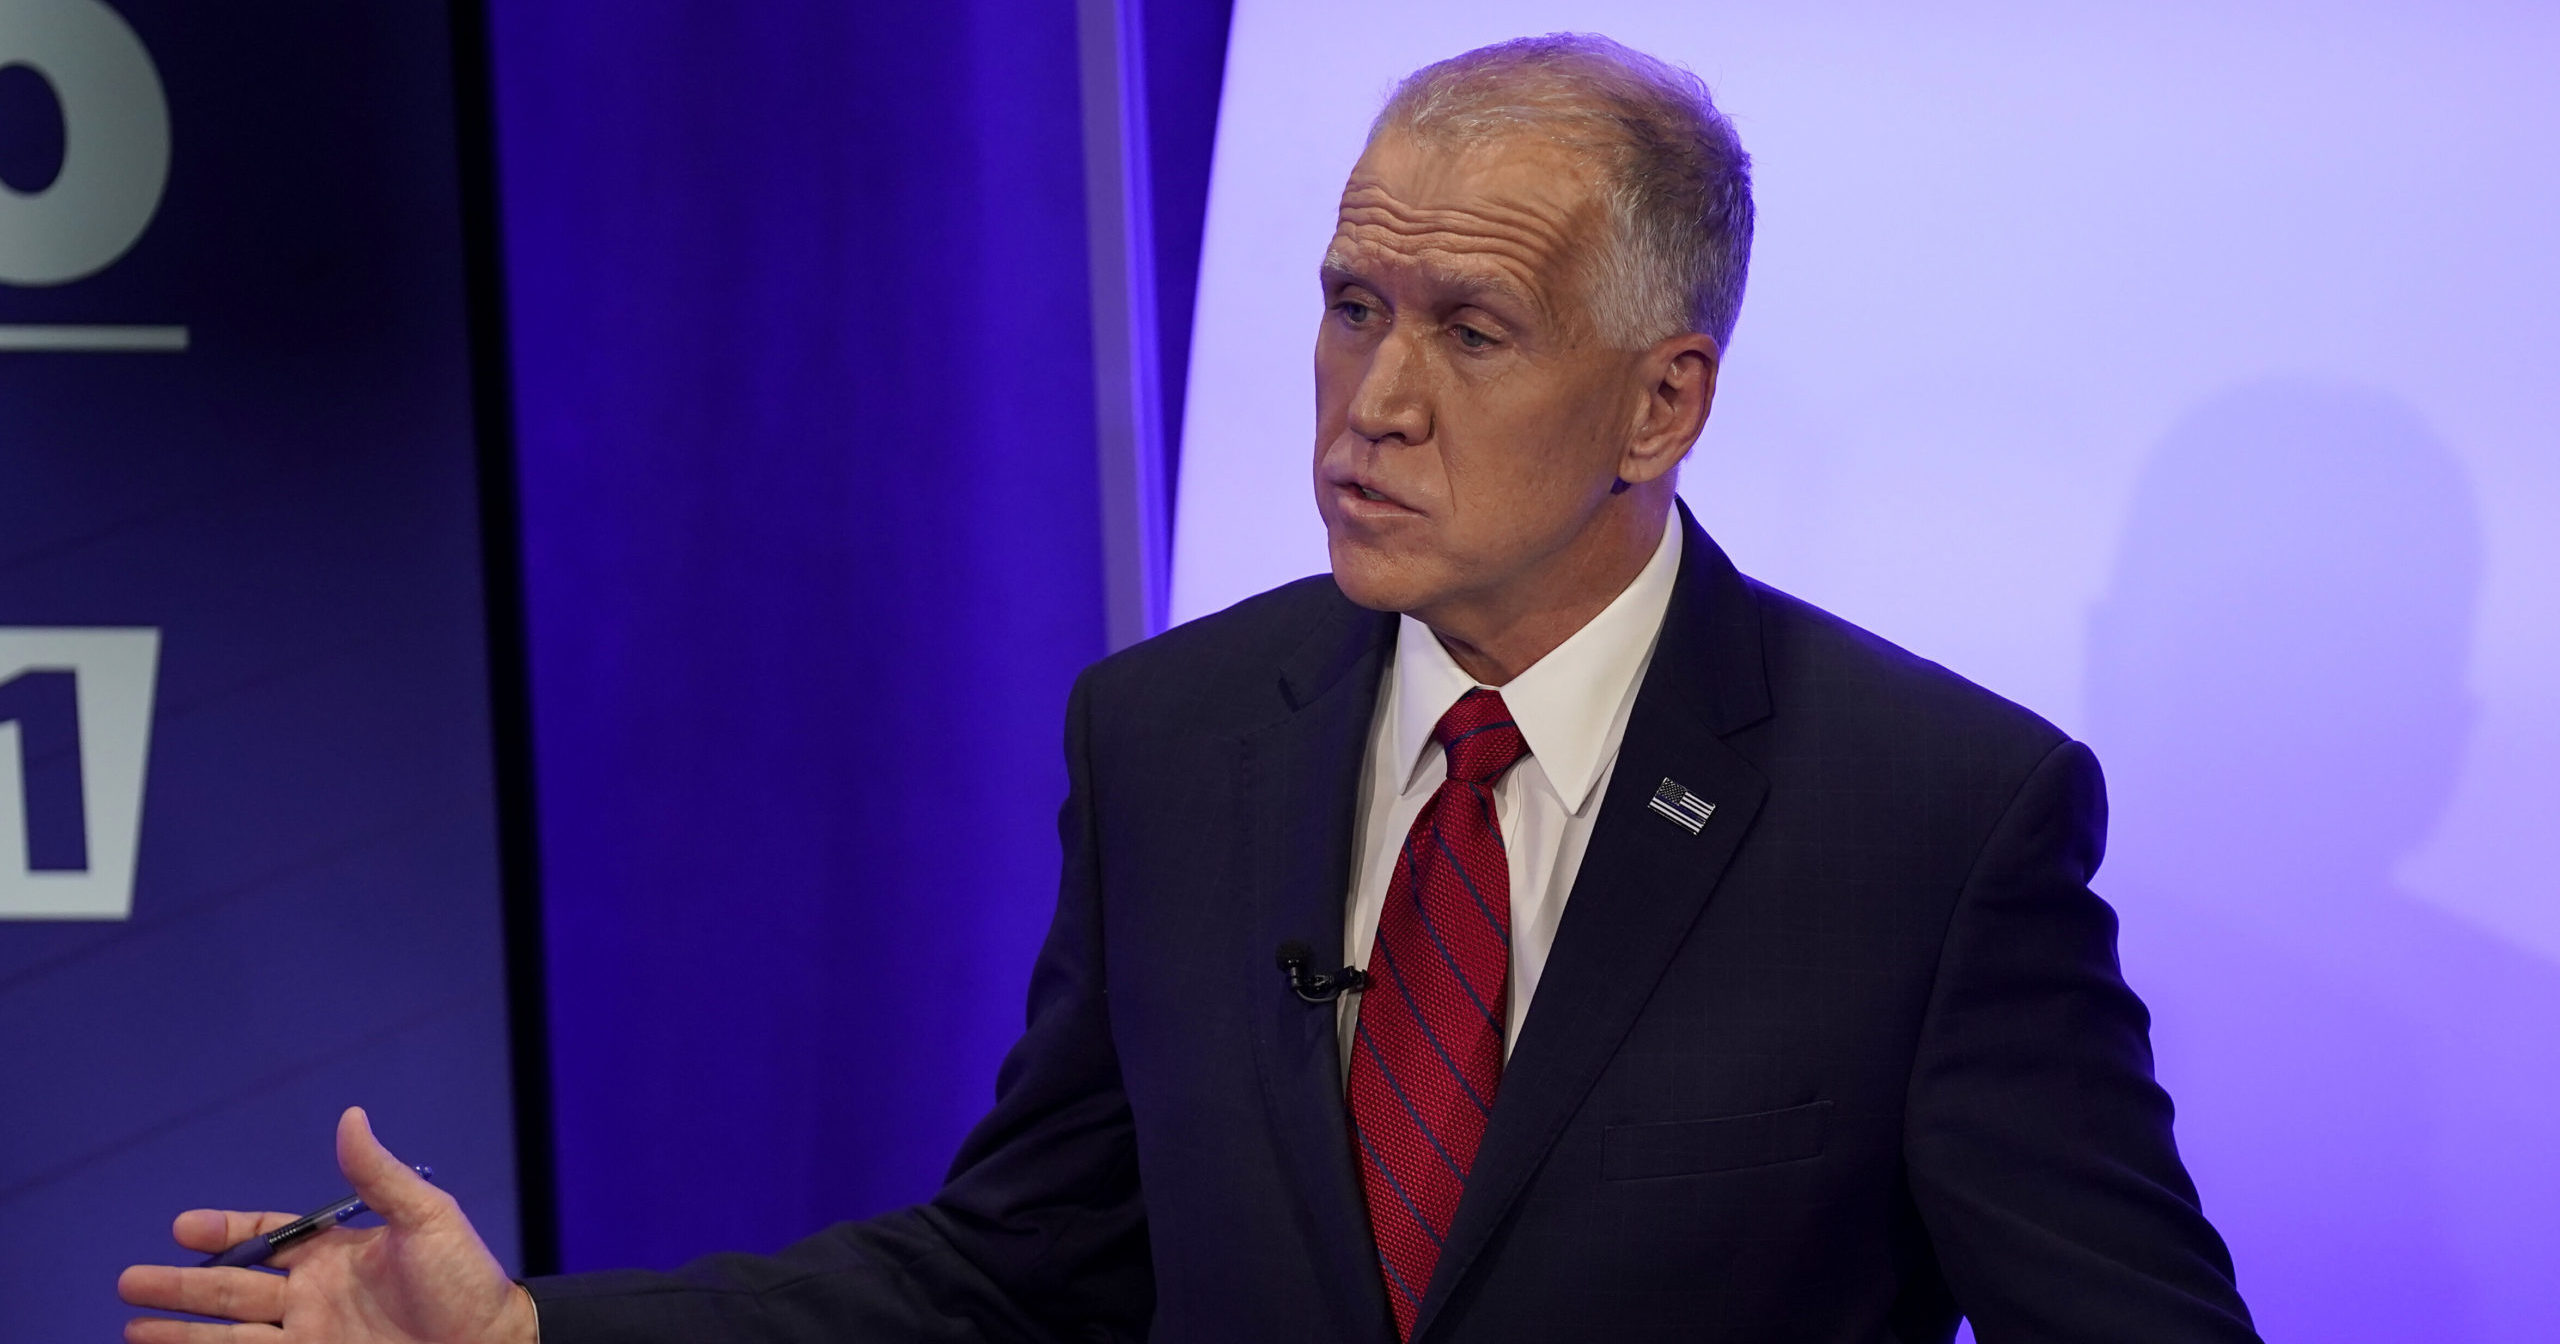 Democrat Cal Cunningham conceded to incumbent Republican U.S. Sen. Thom Tillis in North Carolina on Nov. 10, 2020.